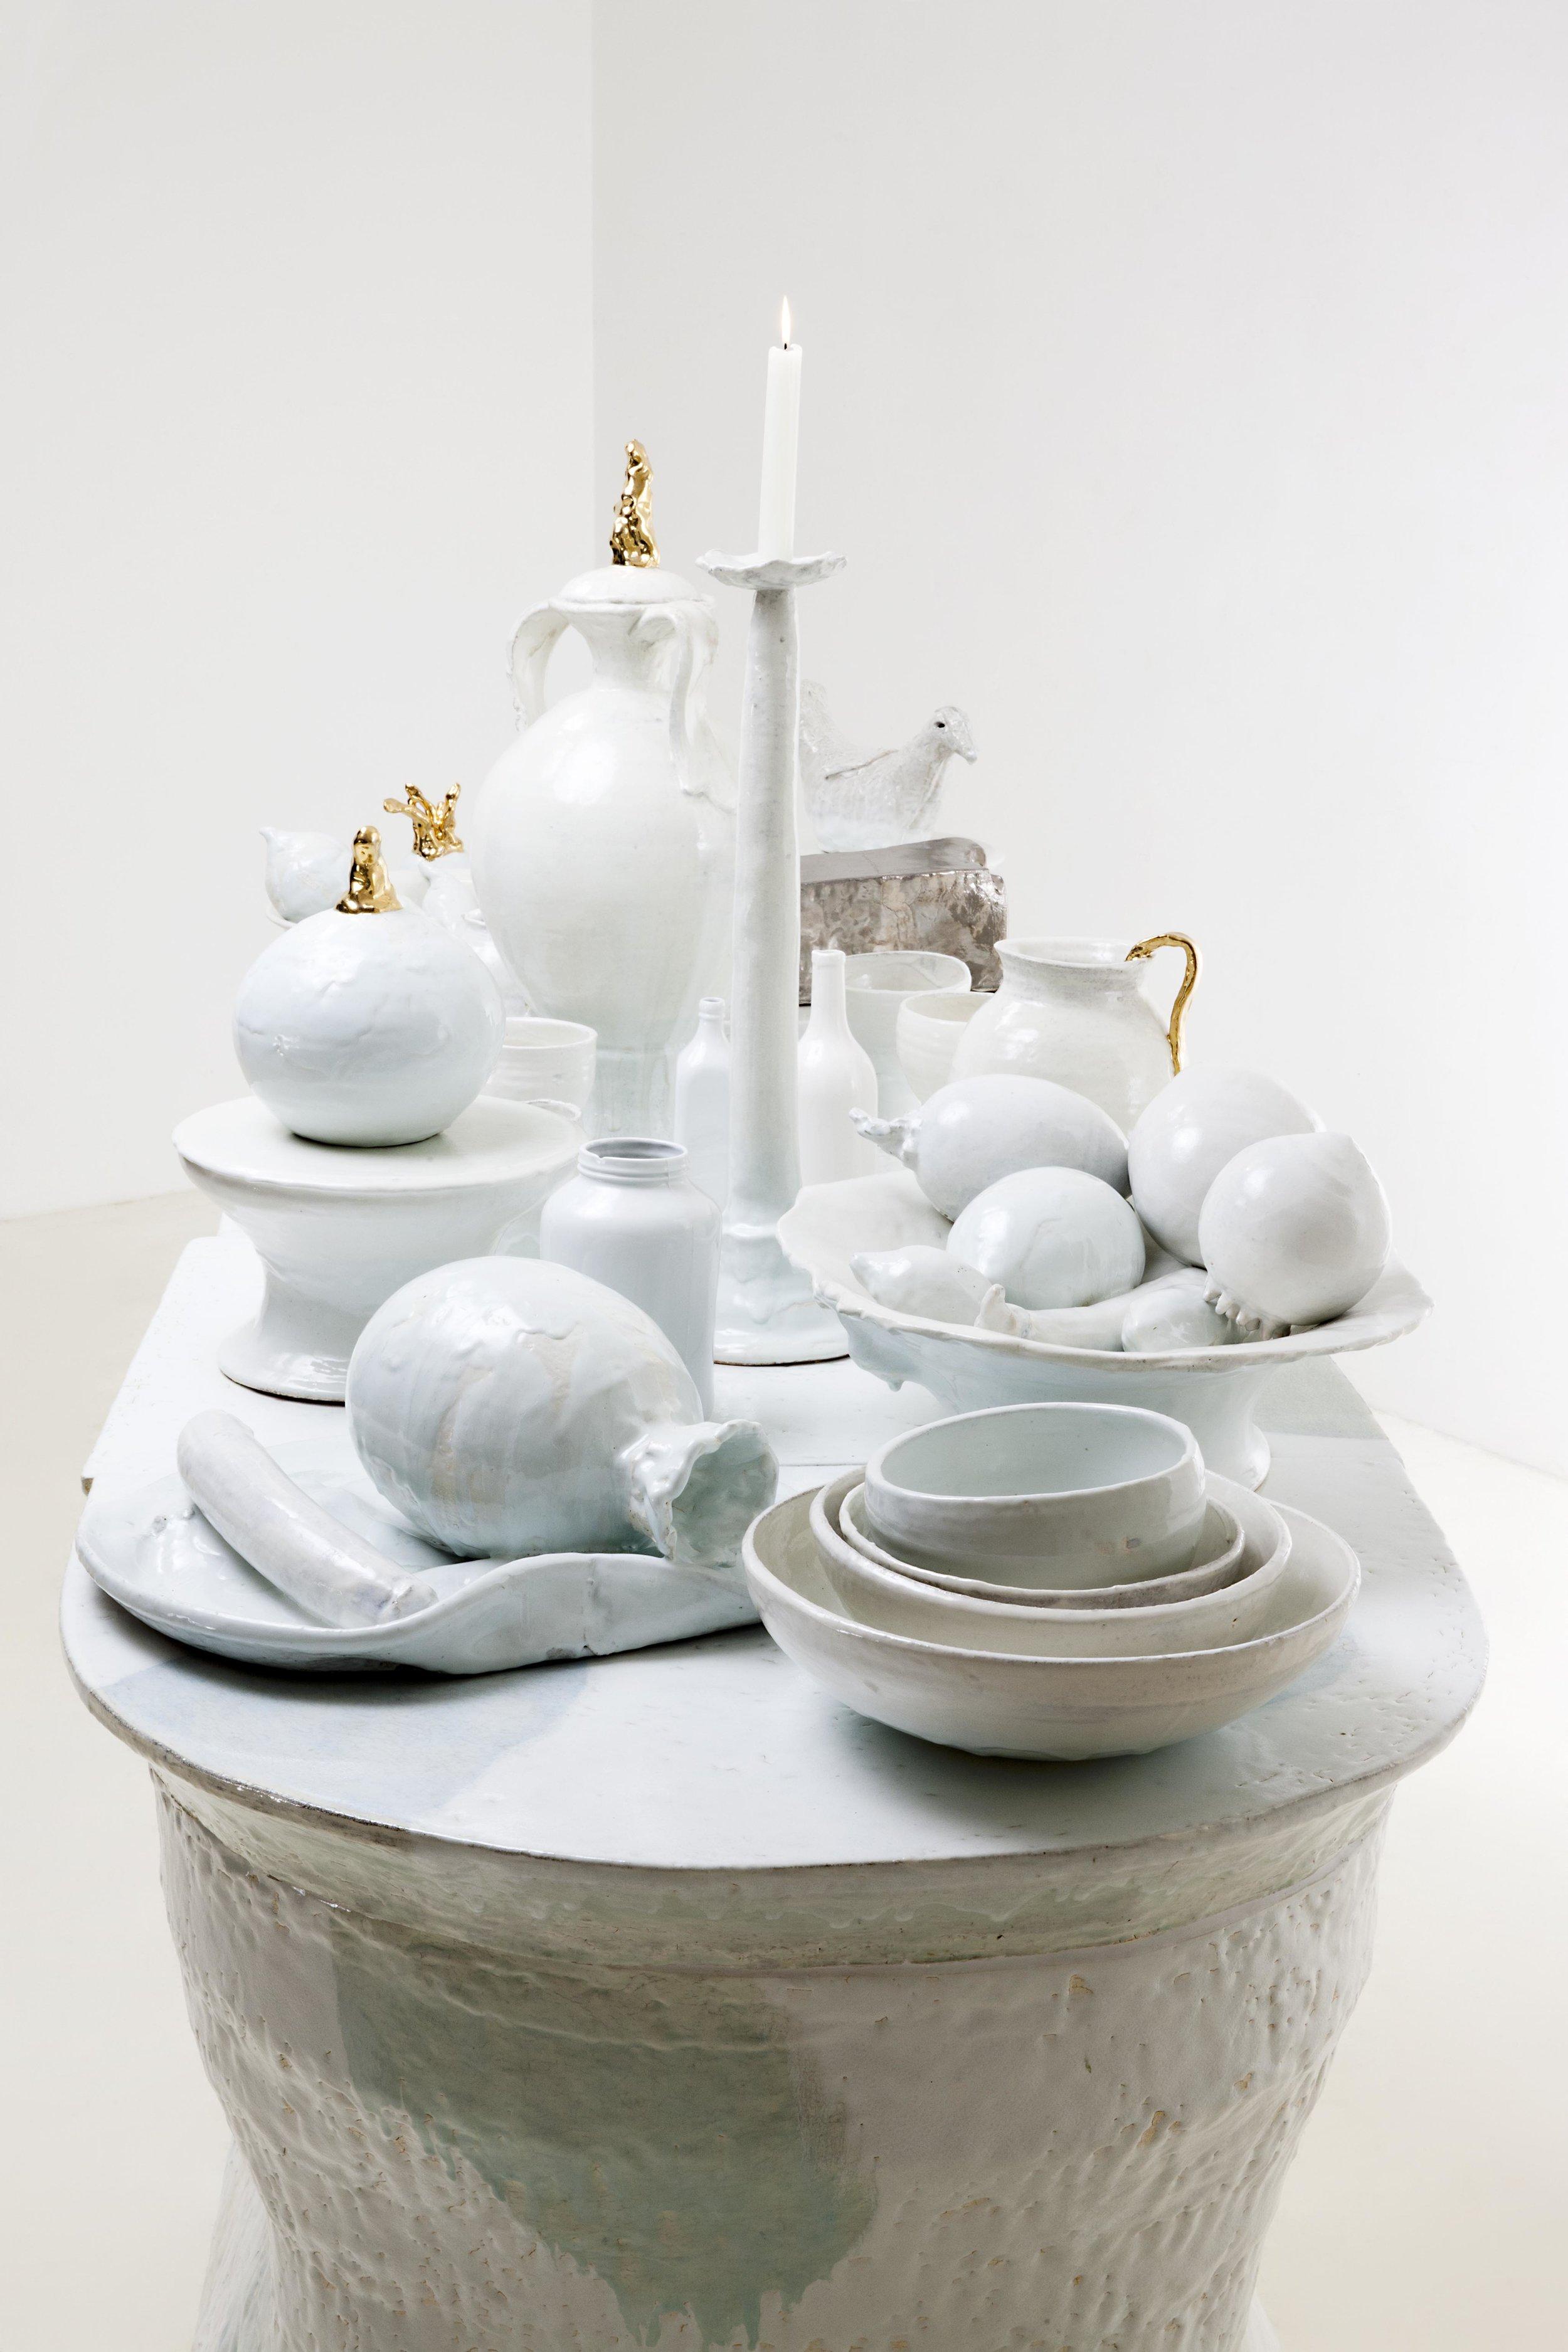 LEE Hun Chung,Bada160111-11,Glazed Ceramic ,276W x 100D x 92H cm,108.7W x 39.4D x 36.2H inch,(Object on the table 77~72H cm),2015 (5).jpg